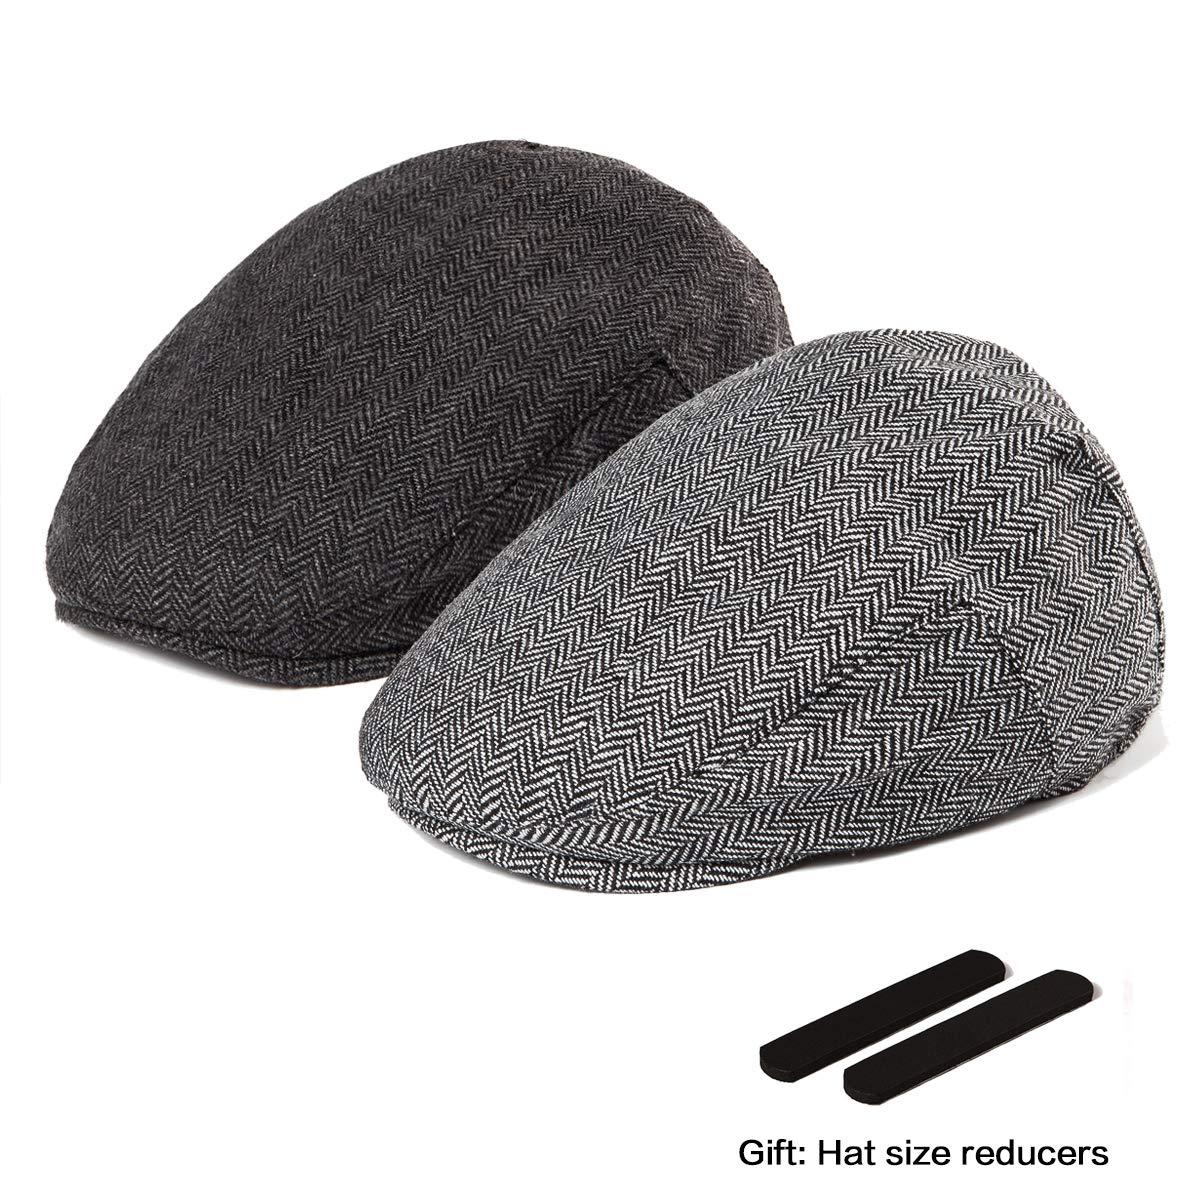 87123c730dc2c LADYBRO Men Newsboy Cap Ivy Hat - 30% Wool Cabbie Hats for Men Irish Tweed  Flat Cap at Amazon Men s Clothing store